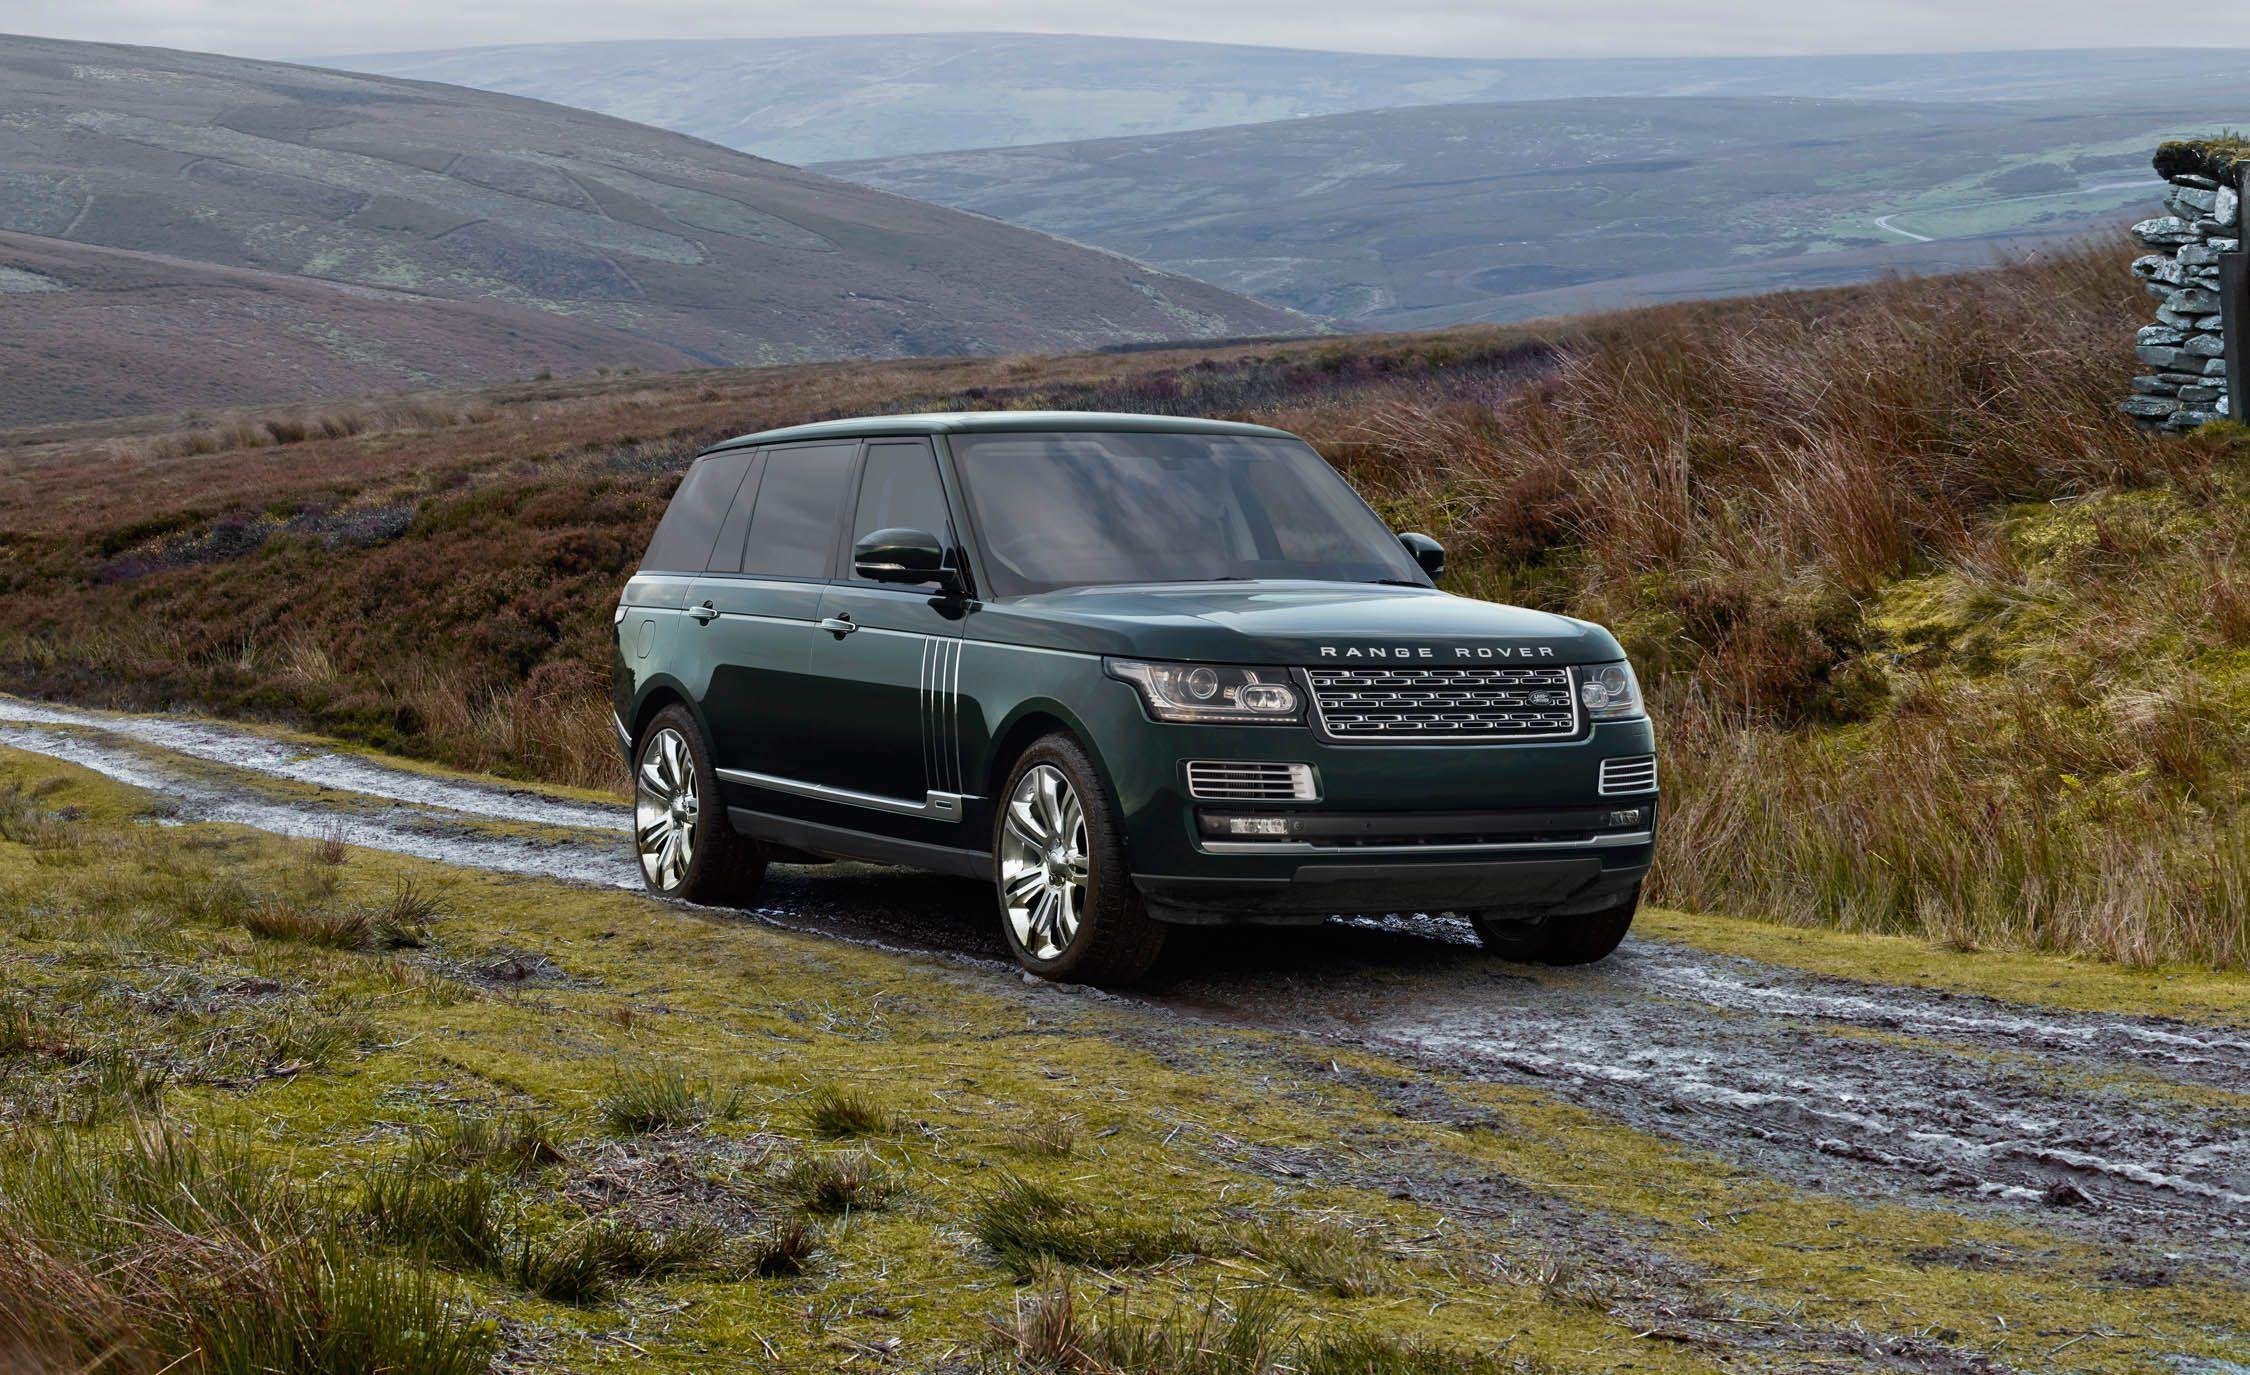 2016 Land Rover Range Rover Gallery